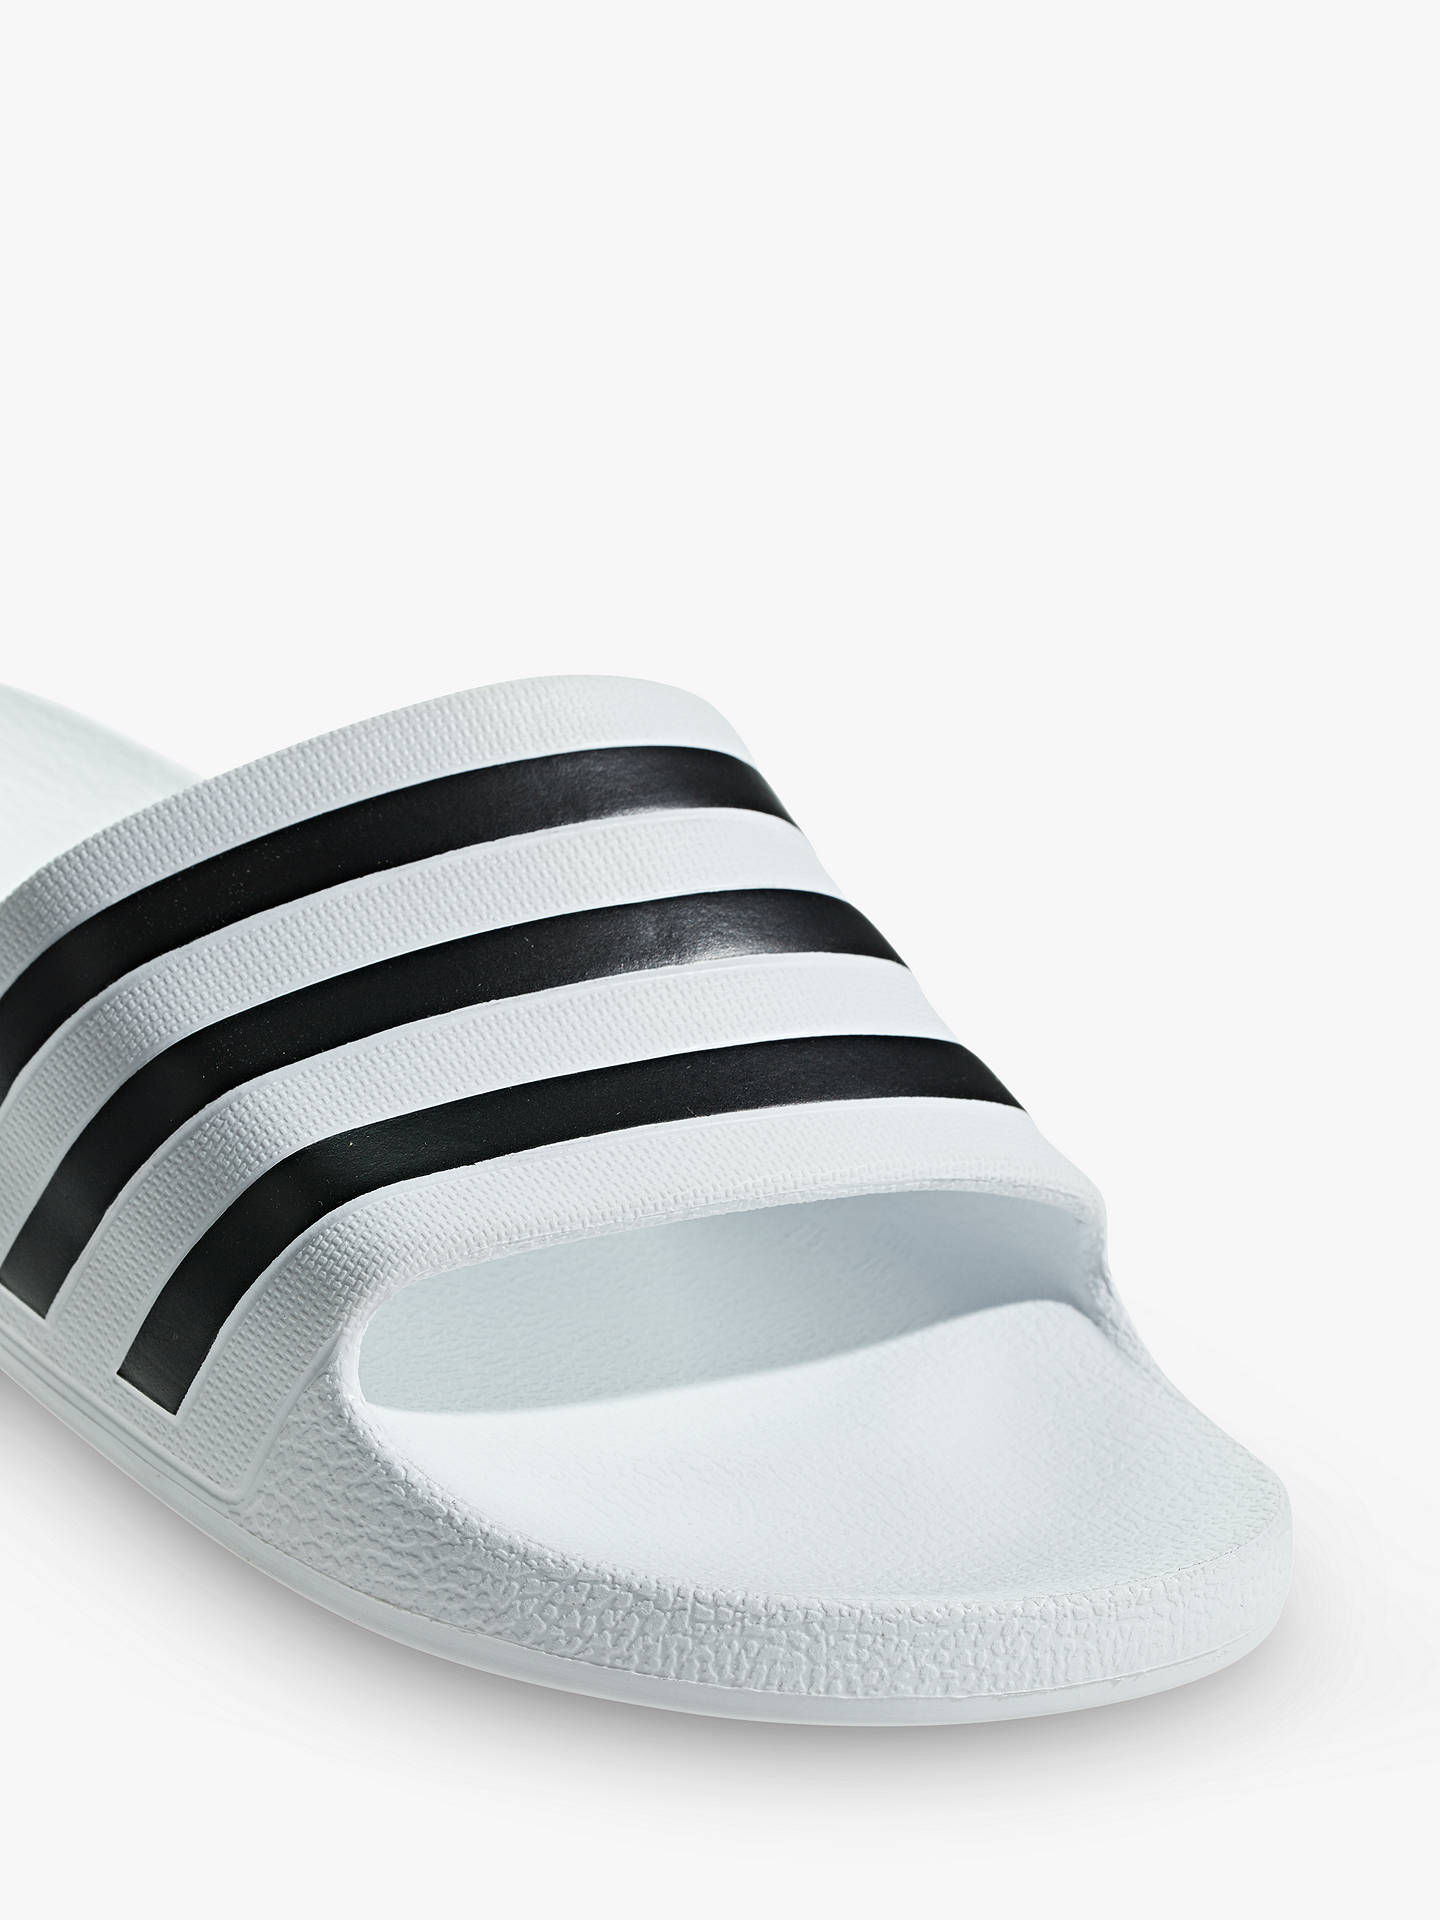 1c865deb3eeb ... Buy adidas Adilette Aqua Women s Slides Slippers